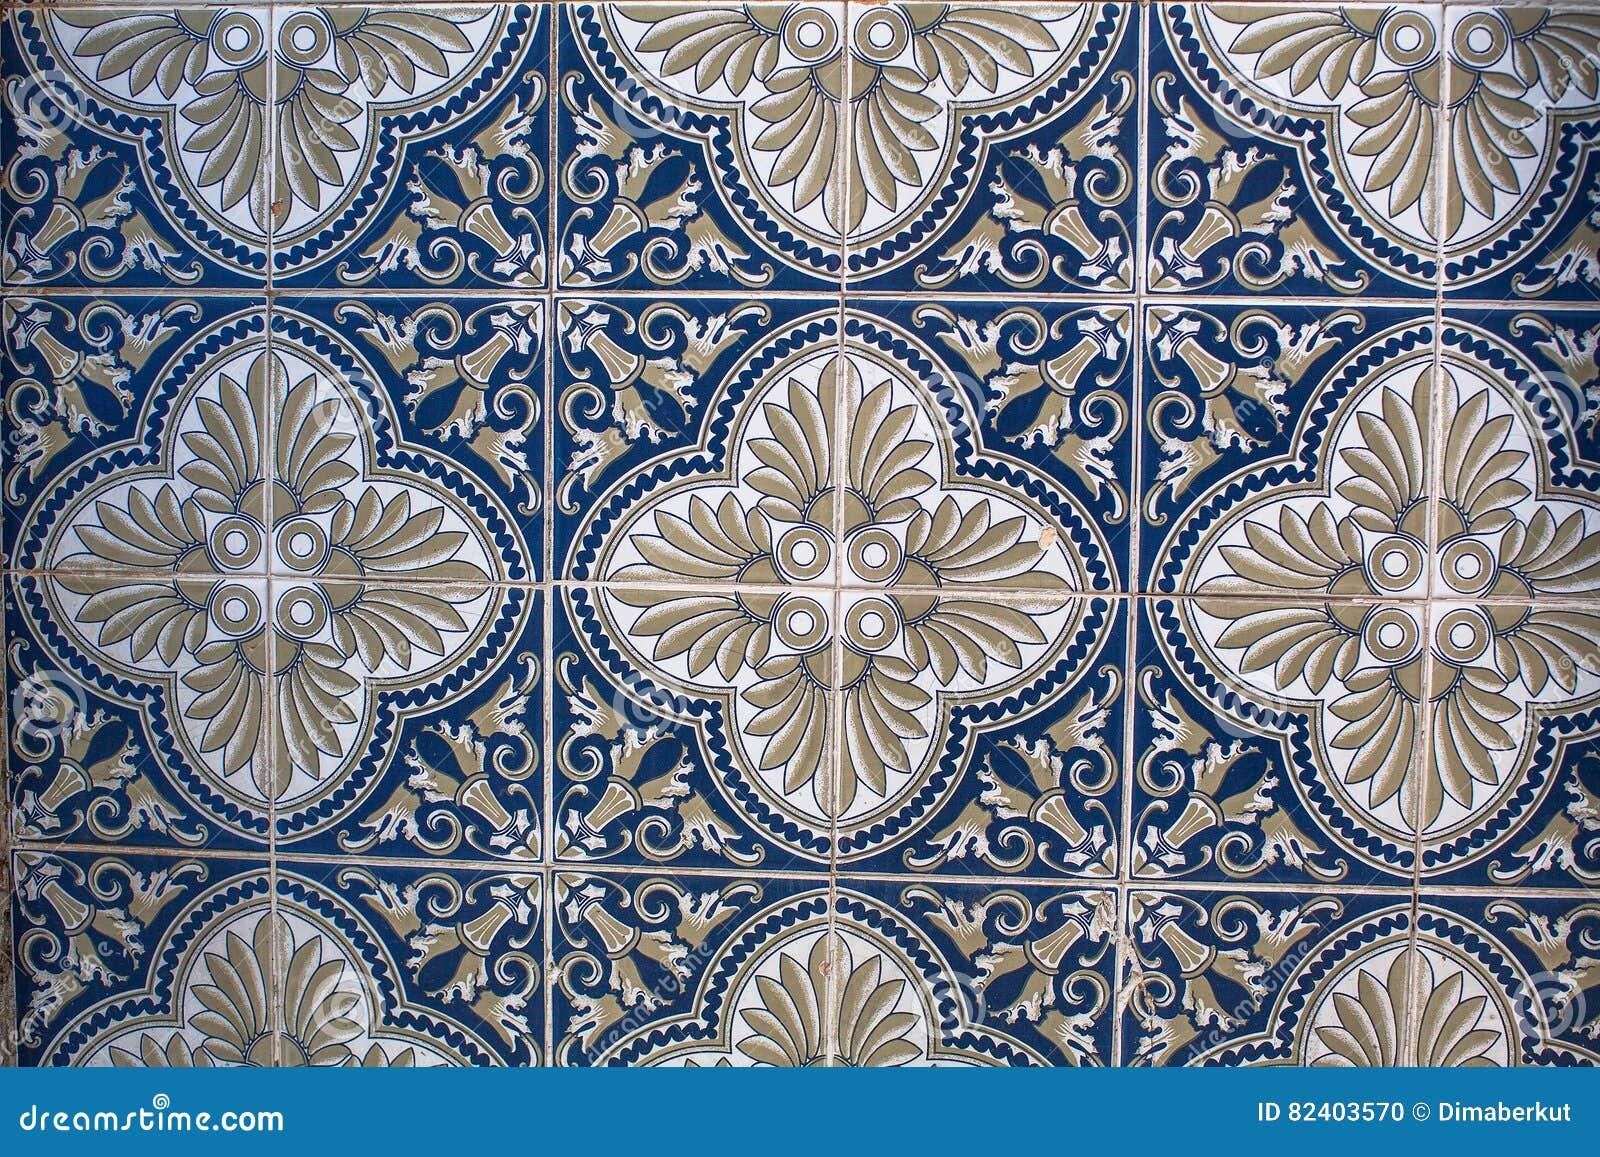 Tegels Met Patroon : Fragment van portugese traditionele tegels azulejo met patroon in